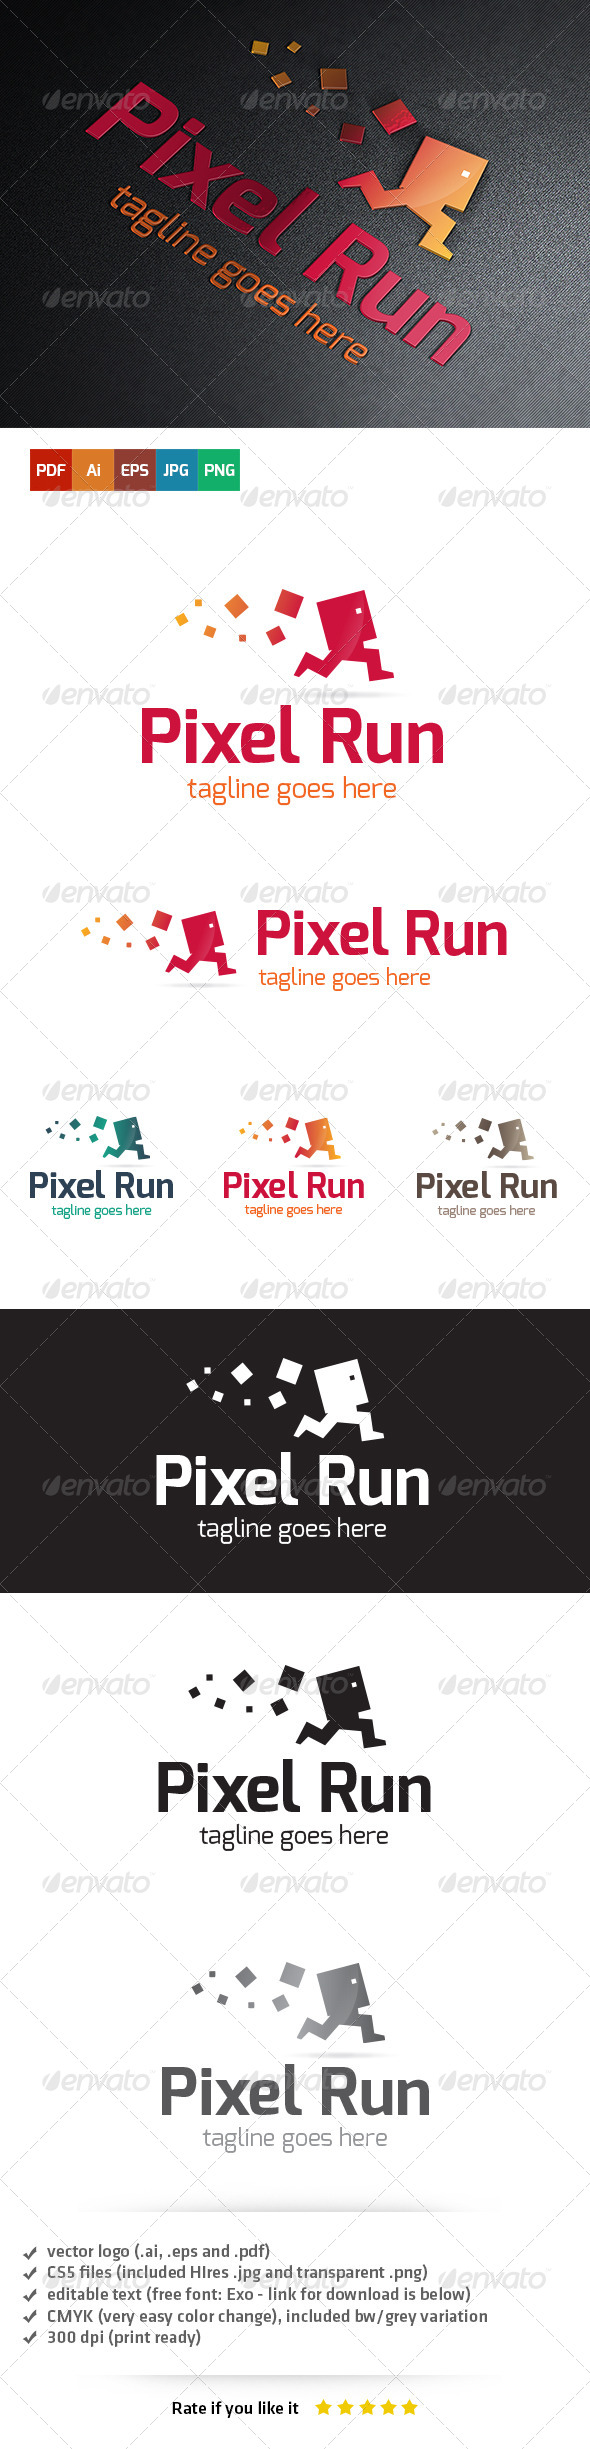 GraphicRiver Pixel Run Logo 5455564